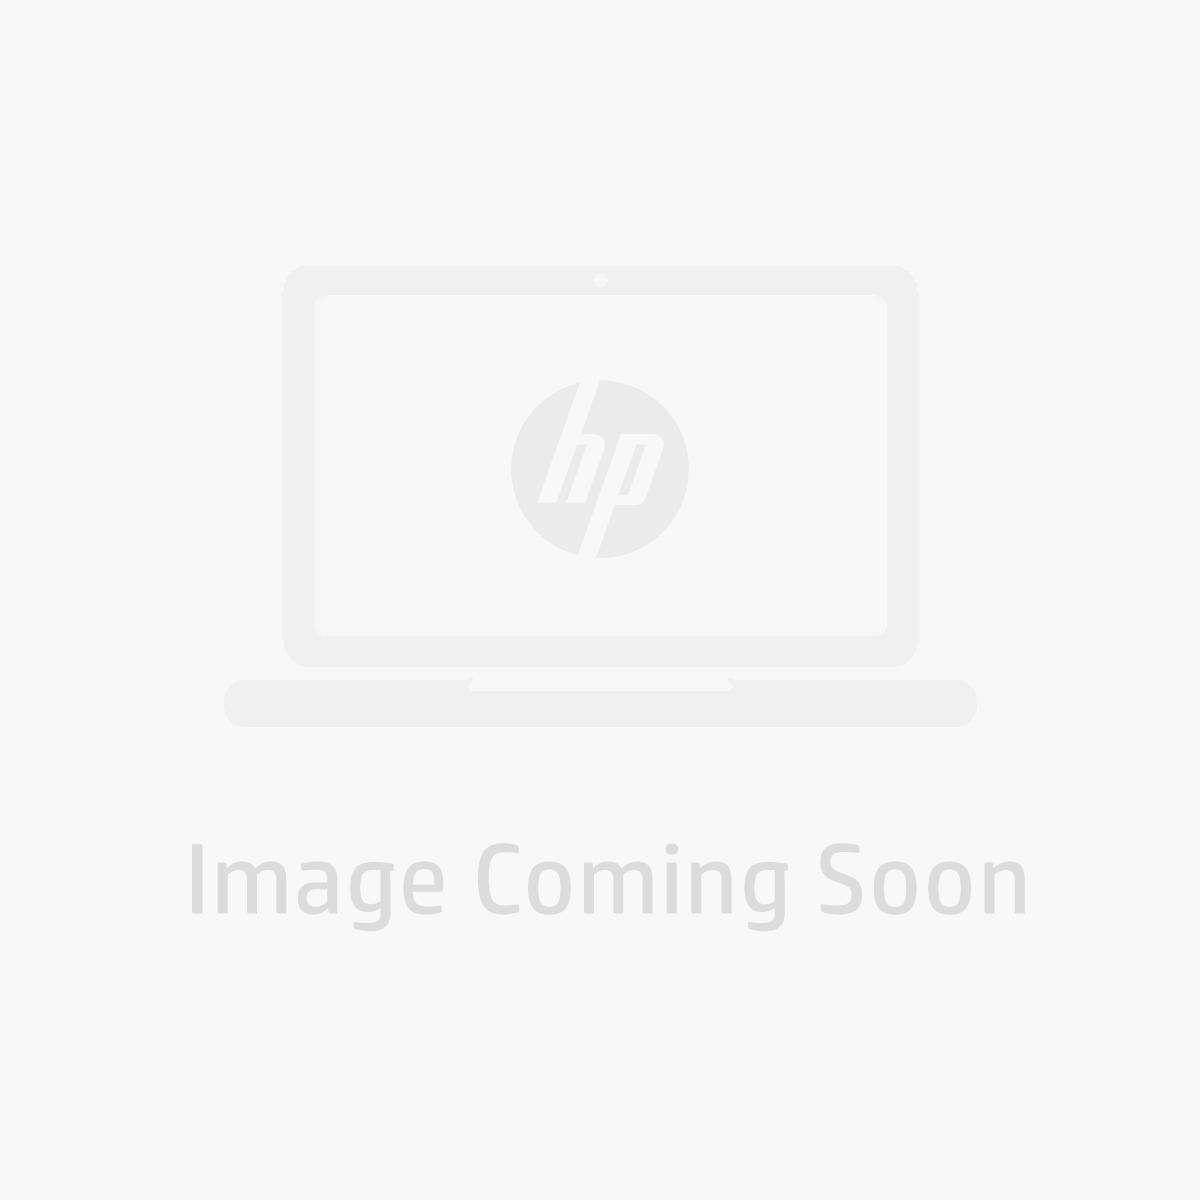 Volkano Slim Series 3.5MM Stereo AUX Cable Black